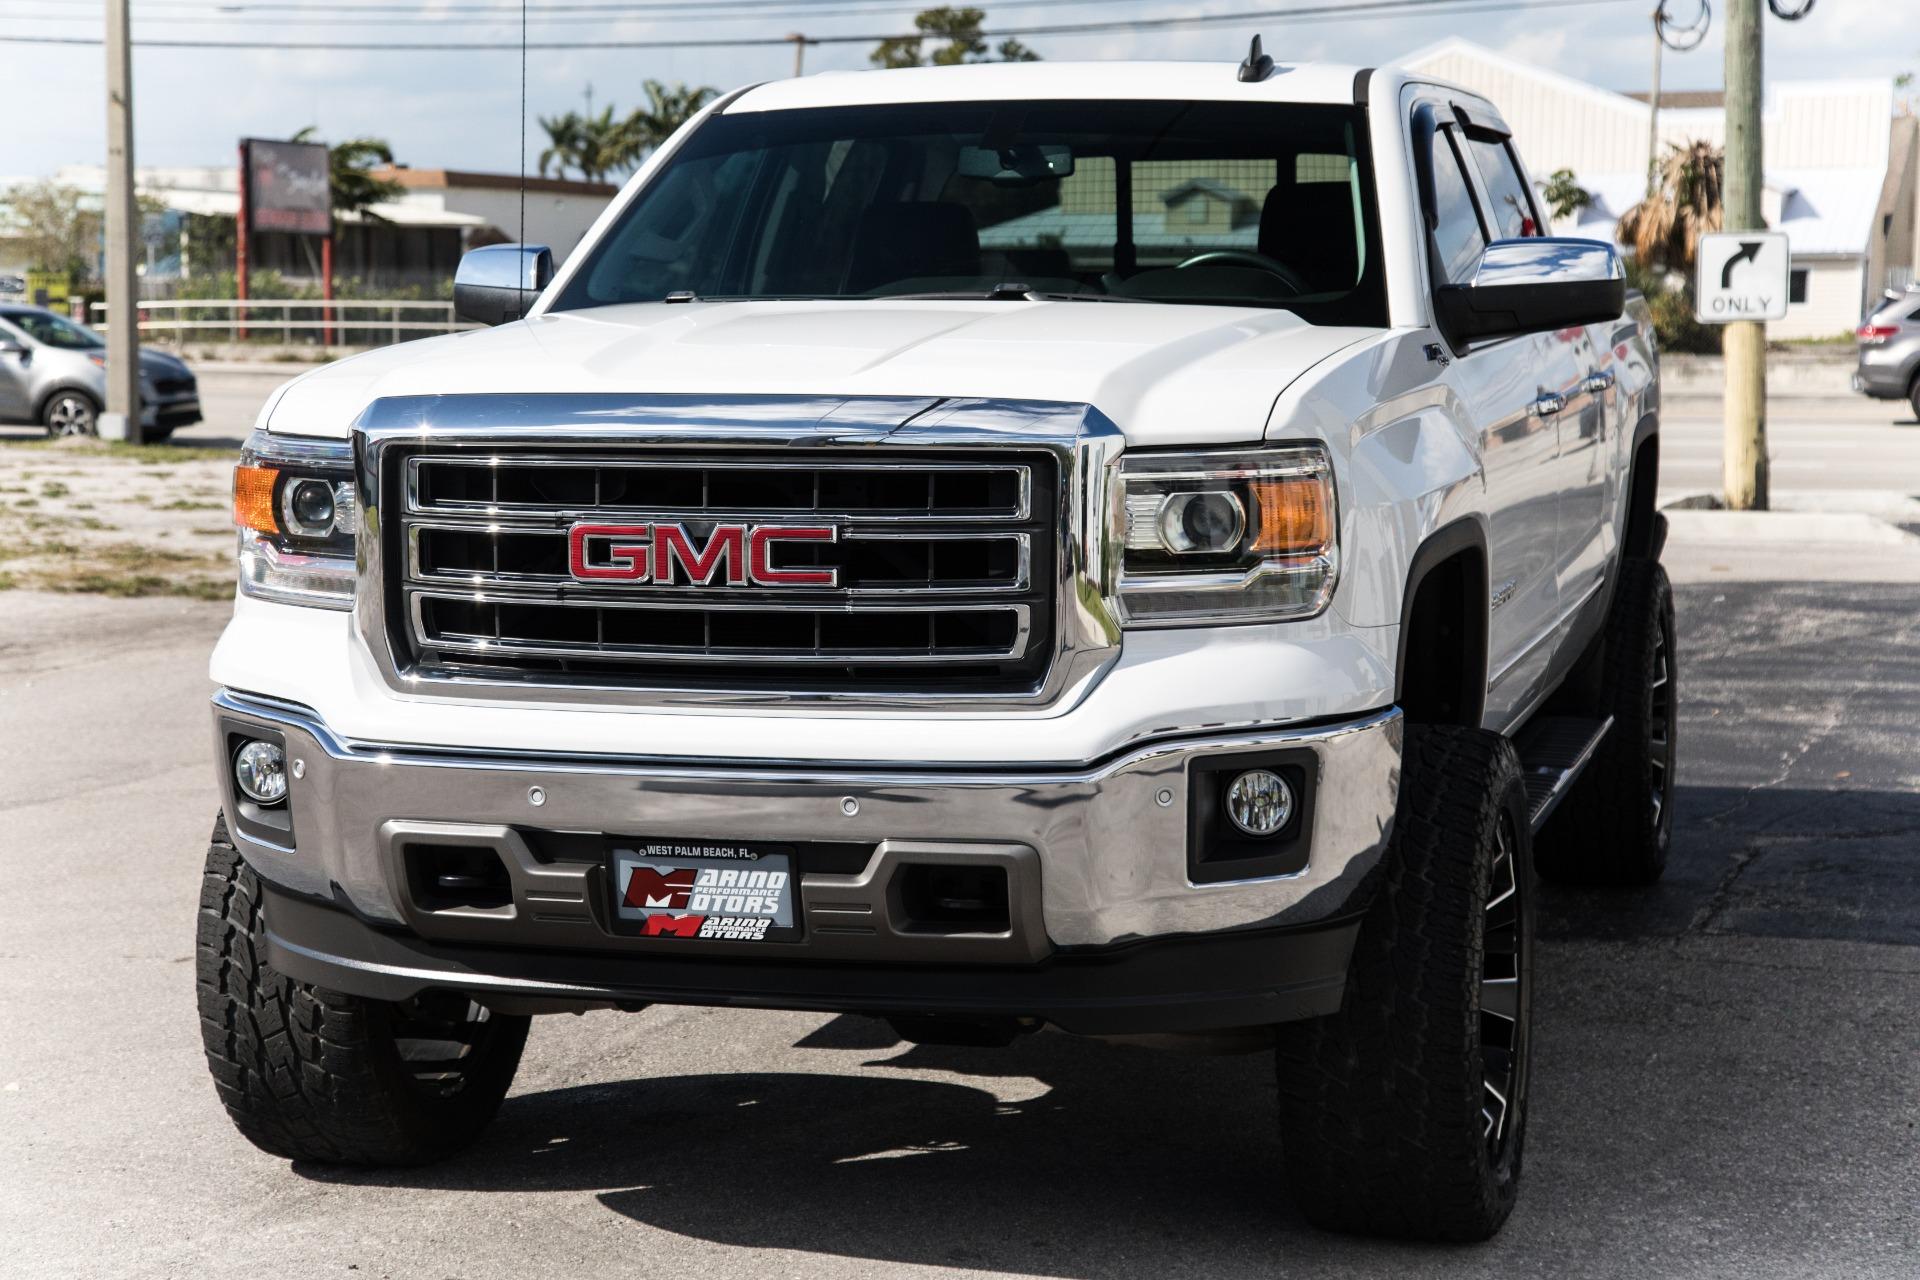 Used-2015-GMC-Sierra-1500-SLT